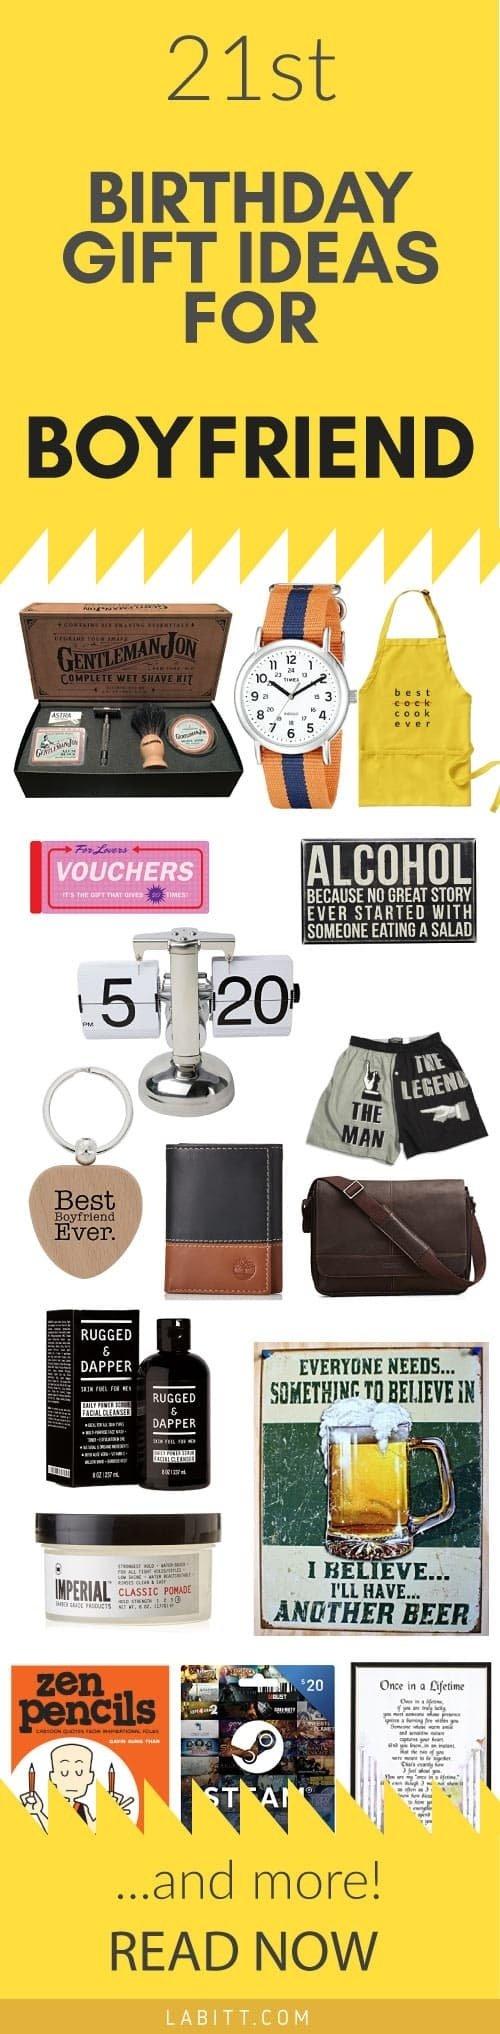 10 Lovable 21St Birthday Gift Ideas For Boyfriend 21st E29da4 Metropolitan